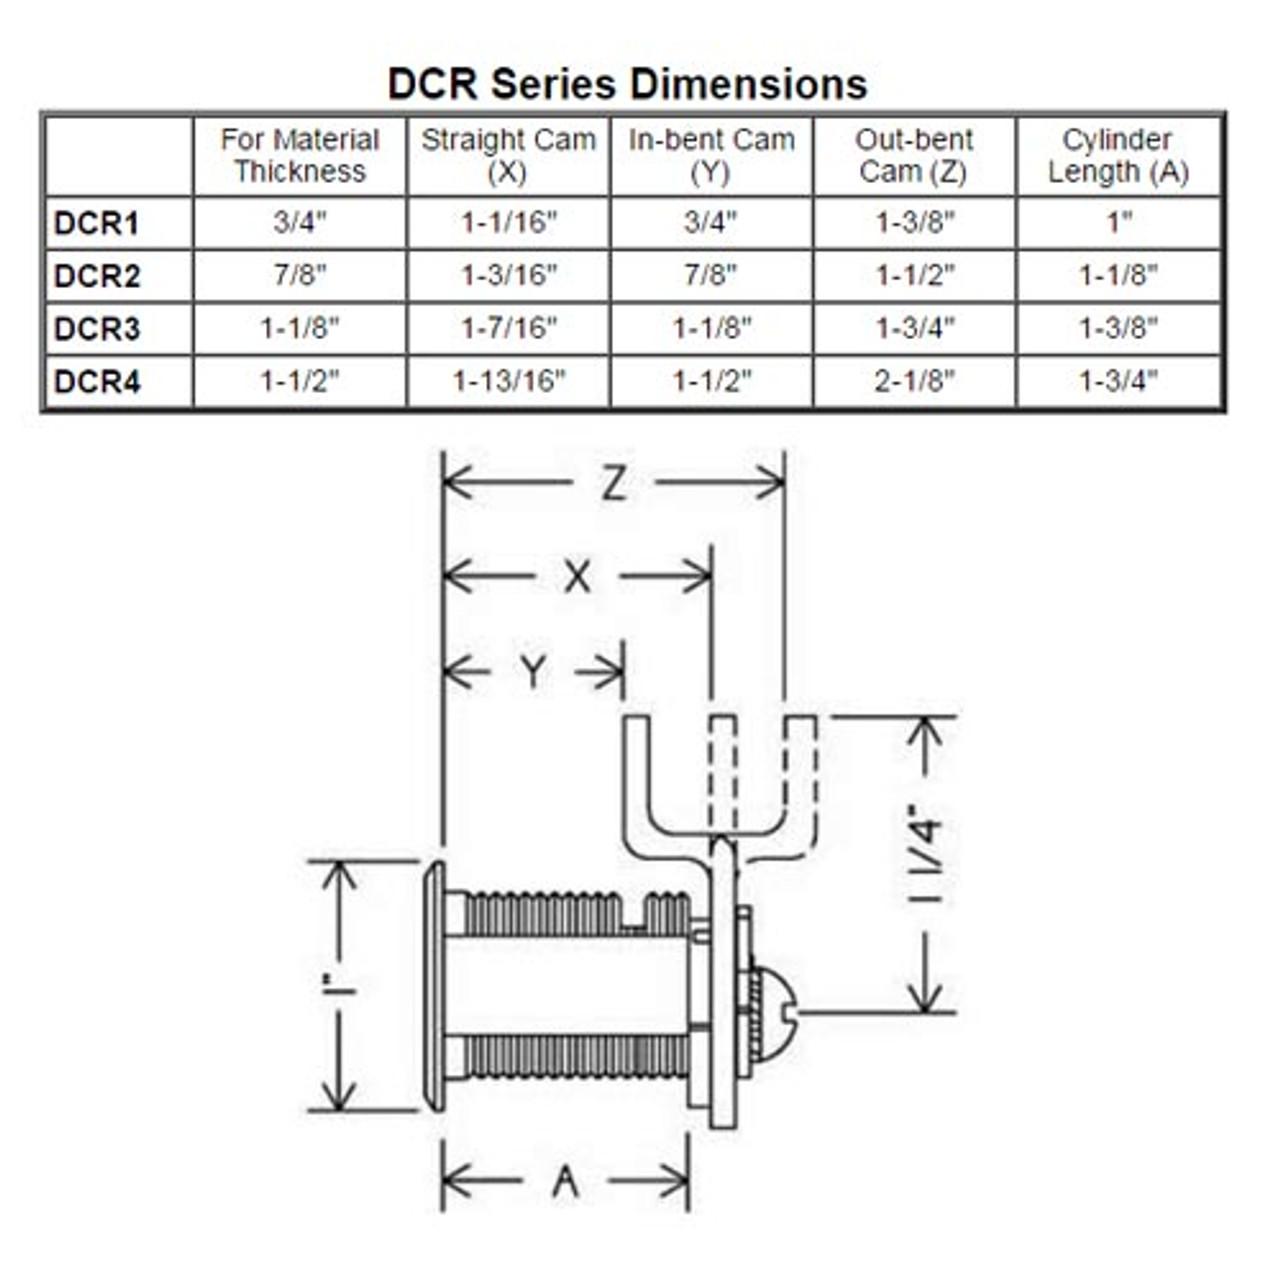 Olympus DCR2-KA4T2-26D R Series Keyed Alike Reversible Cam Lock in Satin Chrome